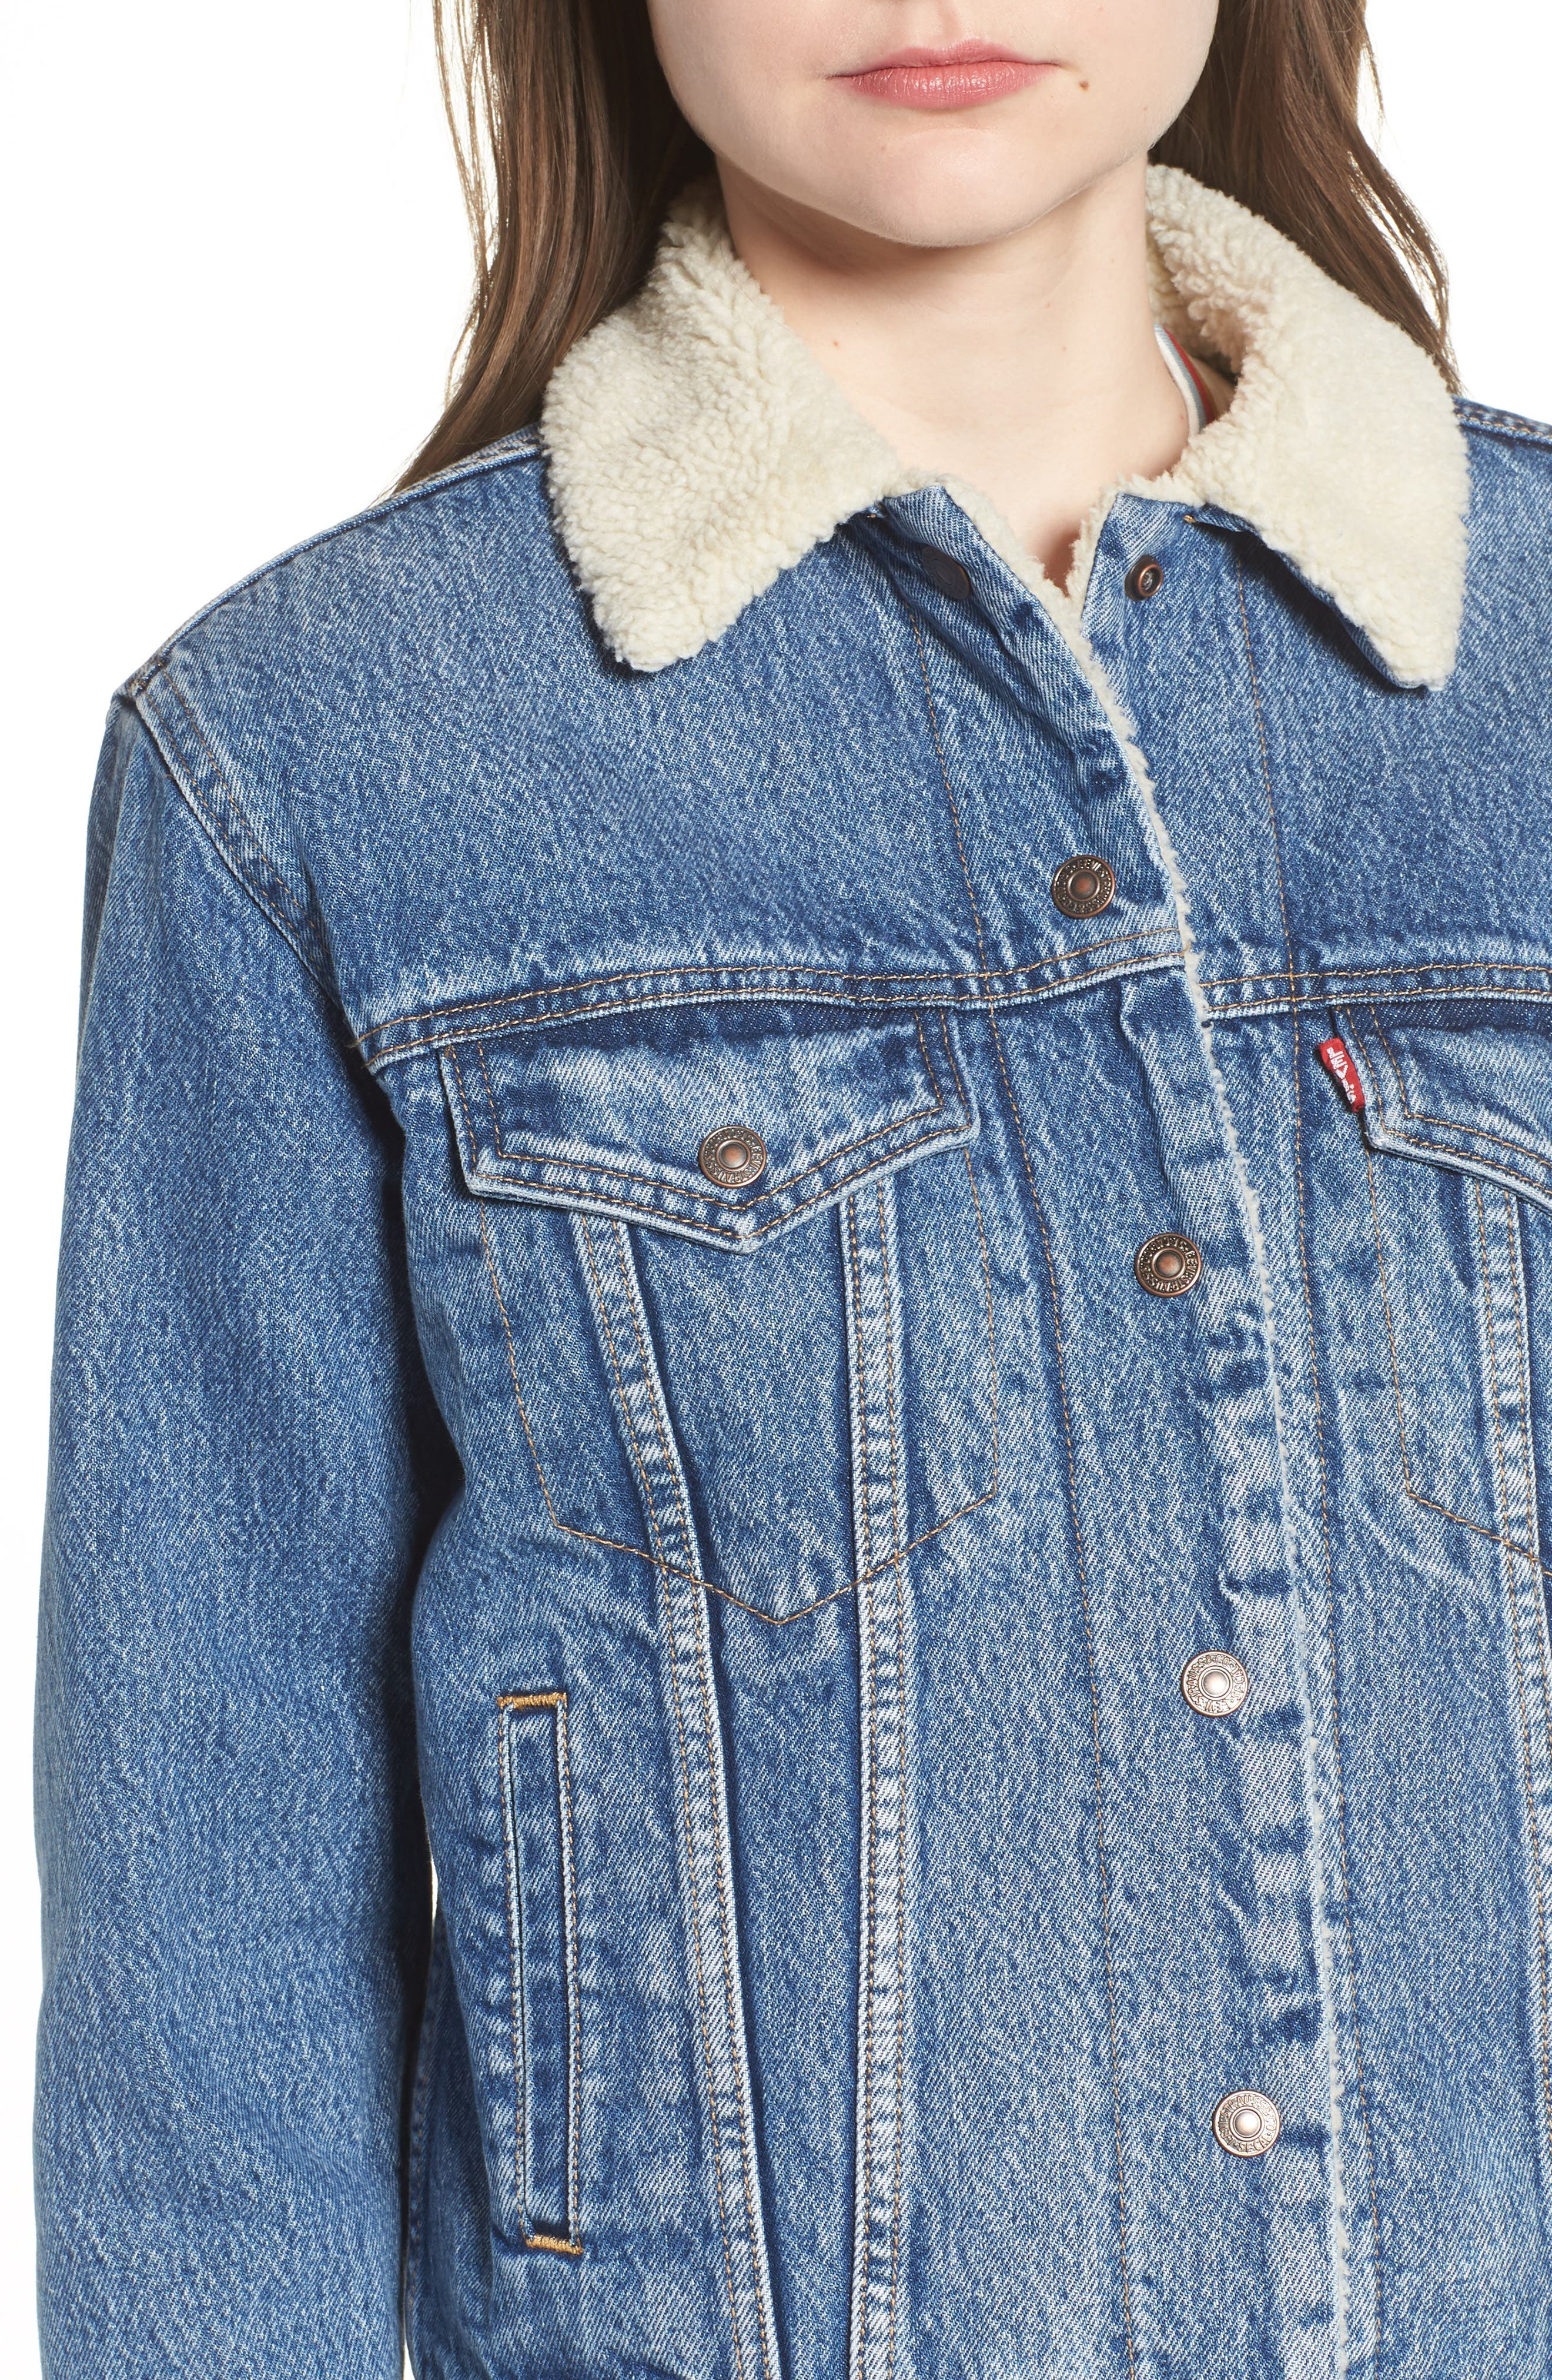 Ex-Boyfriend Fleece Lined Denim Jacket,                             Alternate thumbnail 4, color,                             ADDICTED TO LOVE